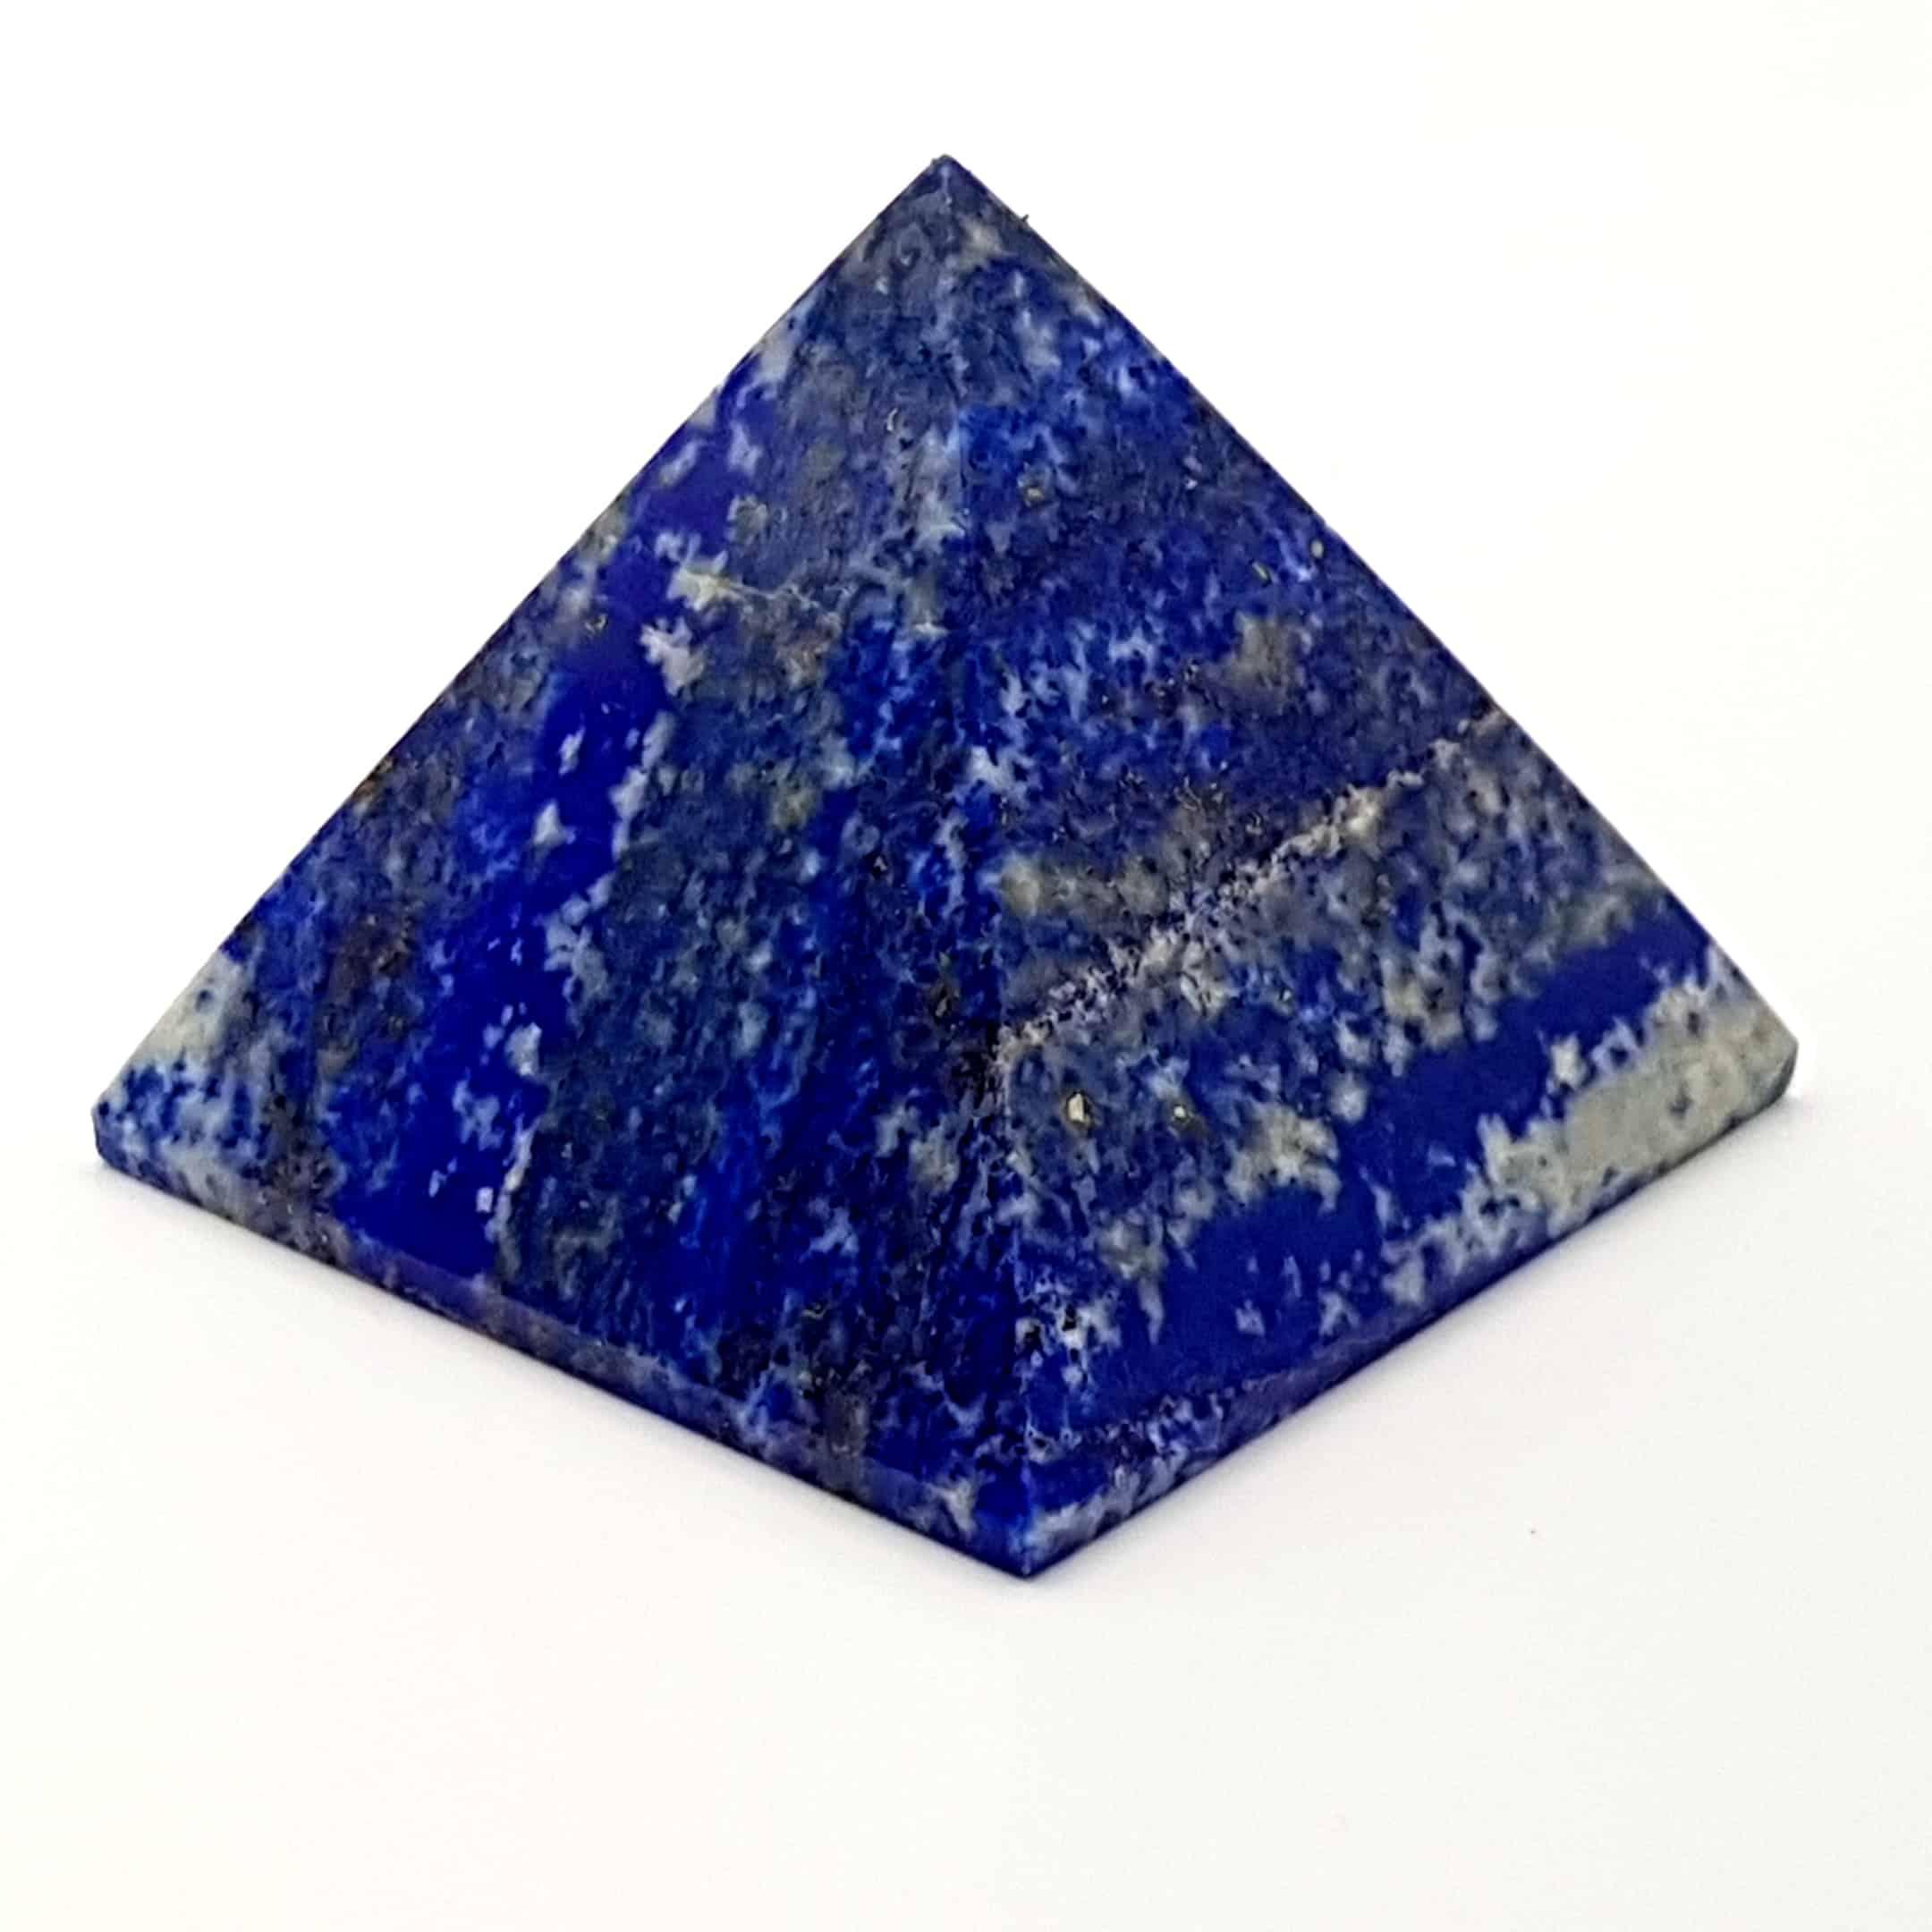 Pirámide de lapislázuli (1)